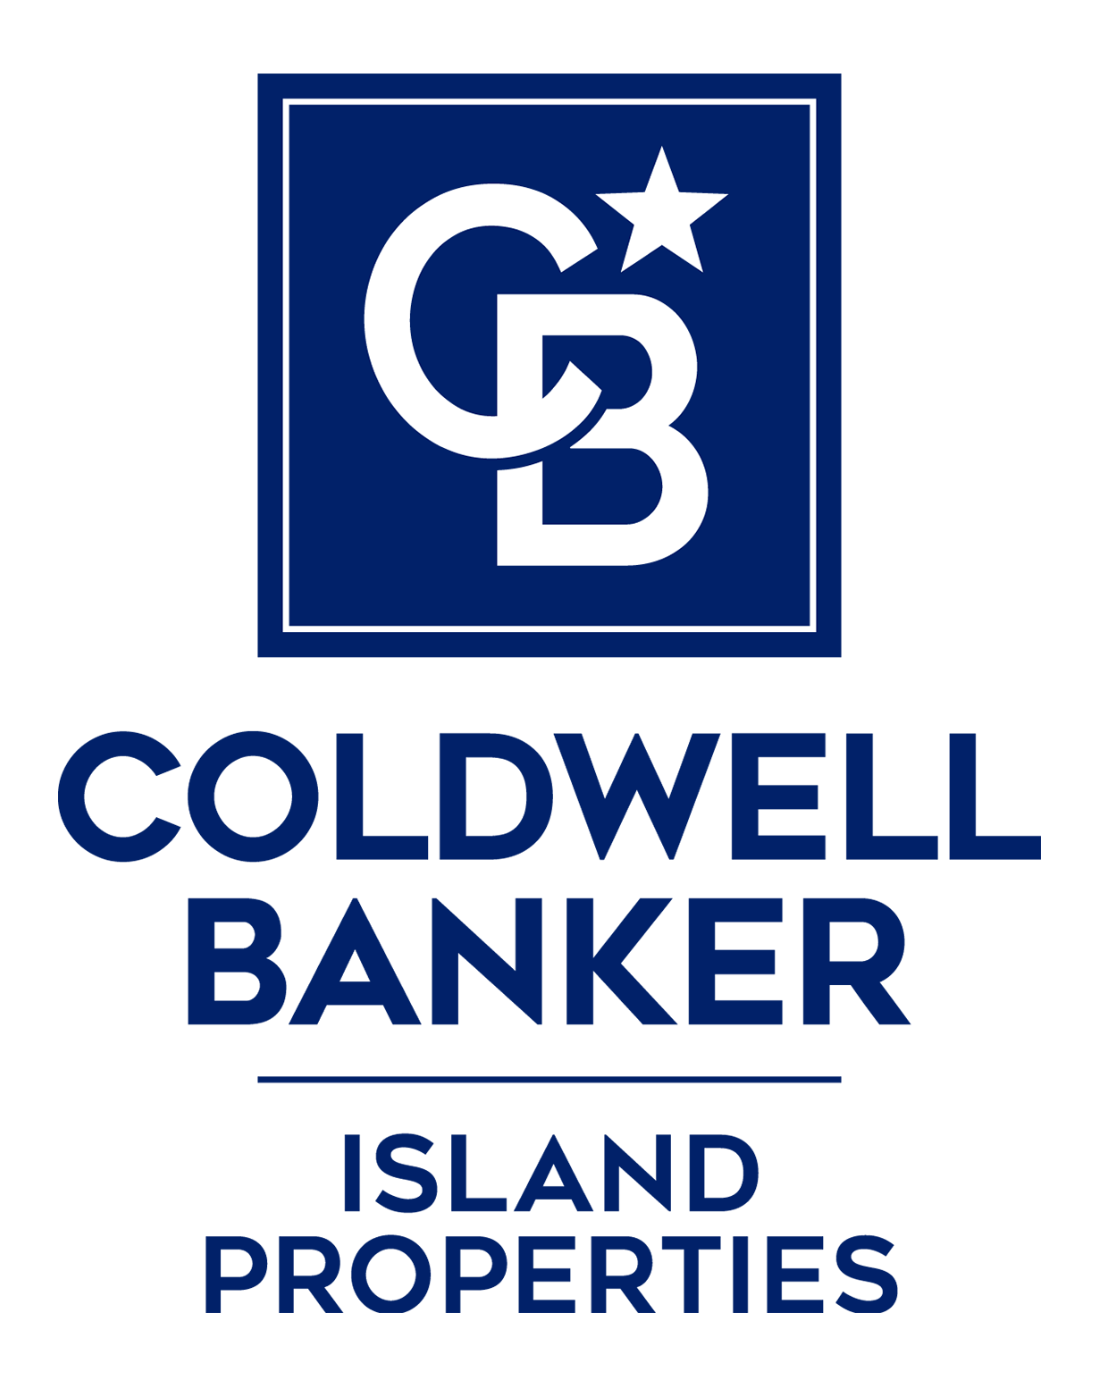 Daniel Defoe - Coldwell Banker Island Properties Logo